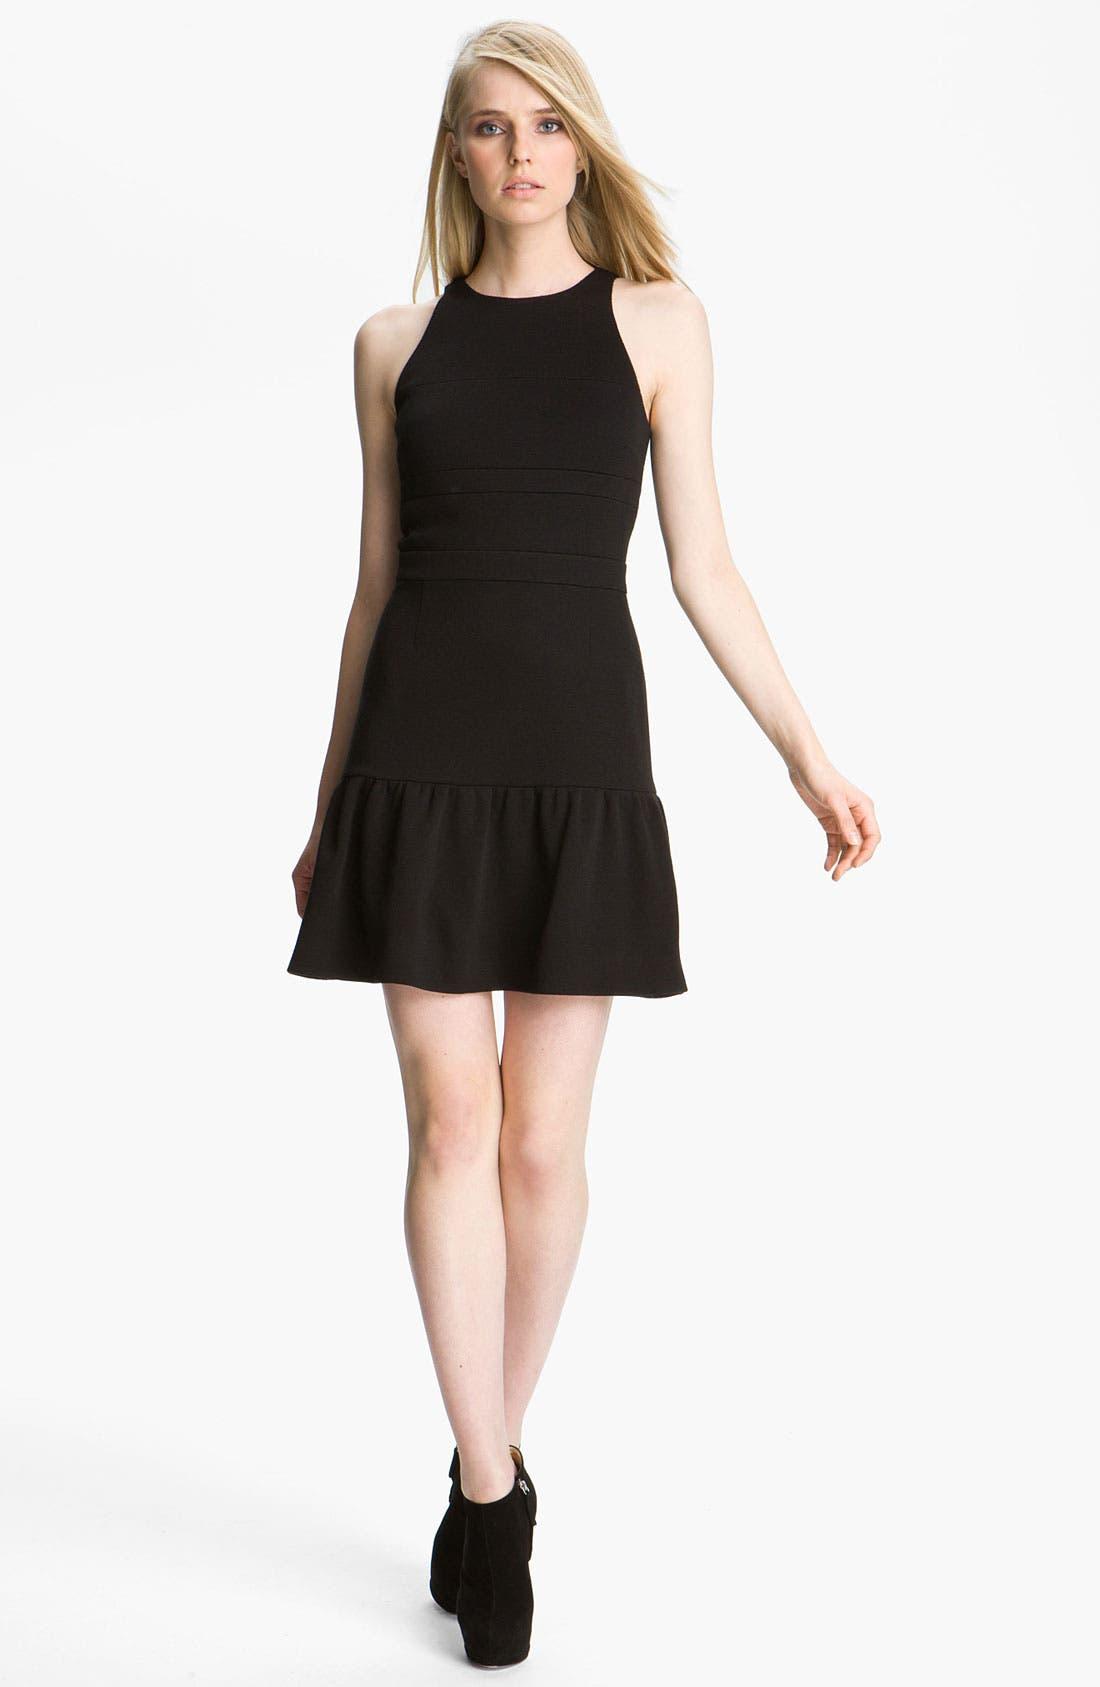 Alternate Image 1 Selected - M Missoni Double Knit Dress